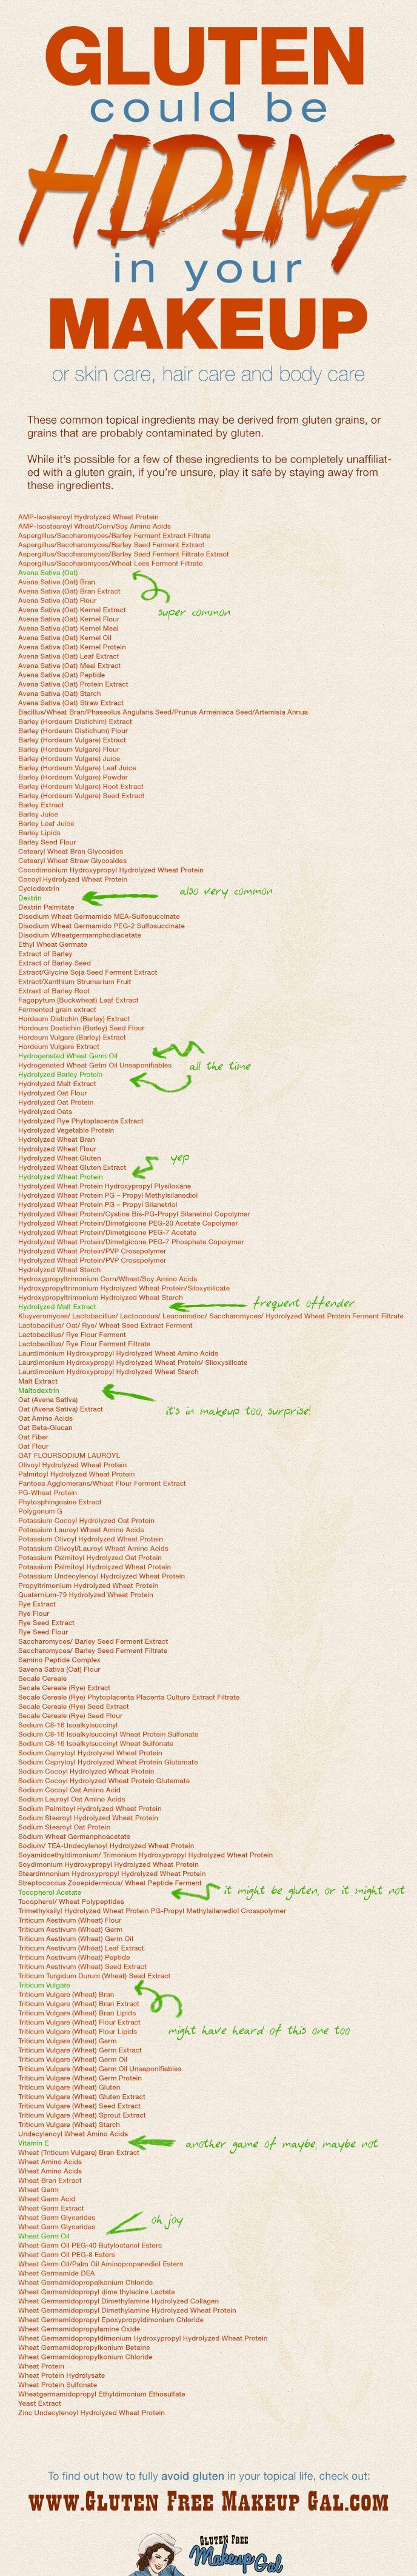 Scientific names of Gluten